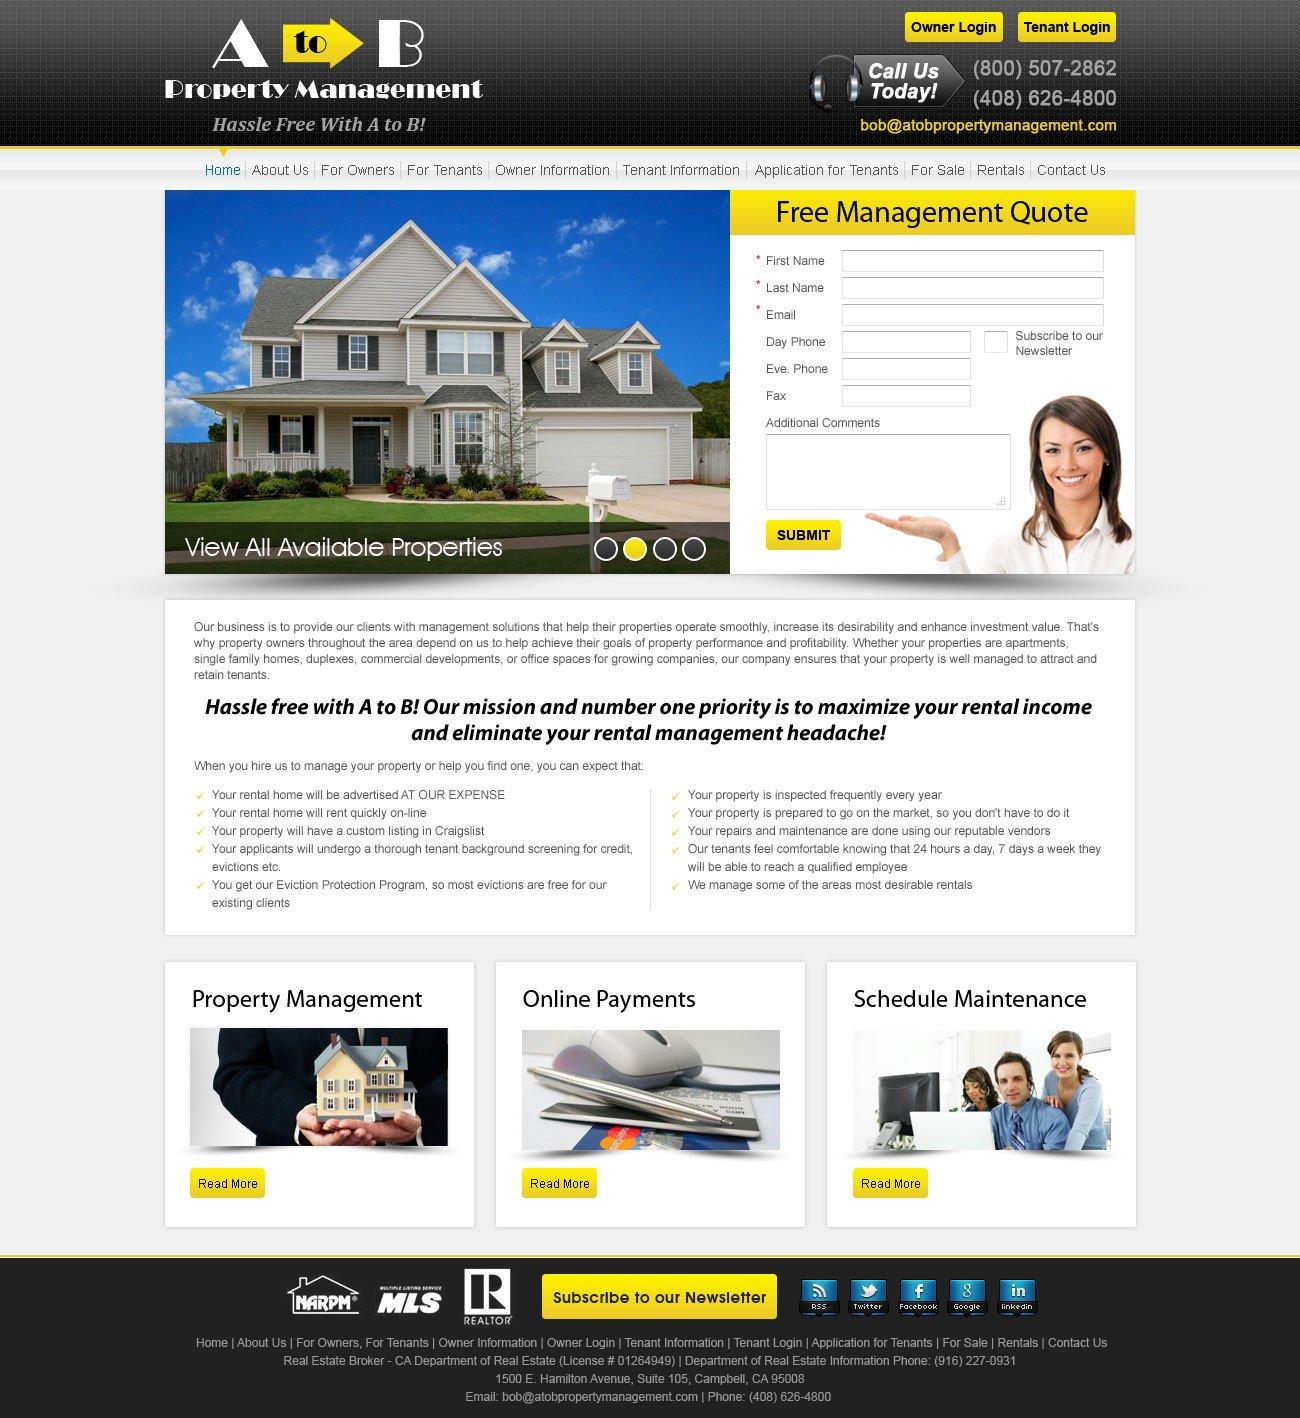 Property Management Websites Templates Custom Wordpress theme for Property Management Websites